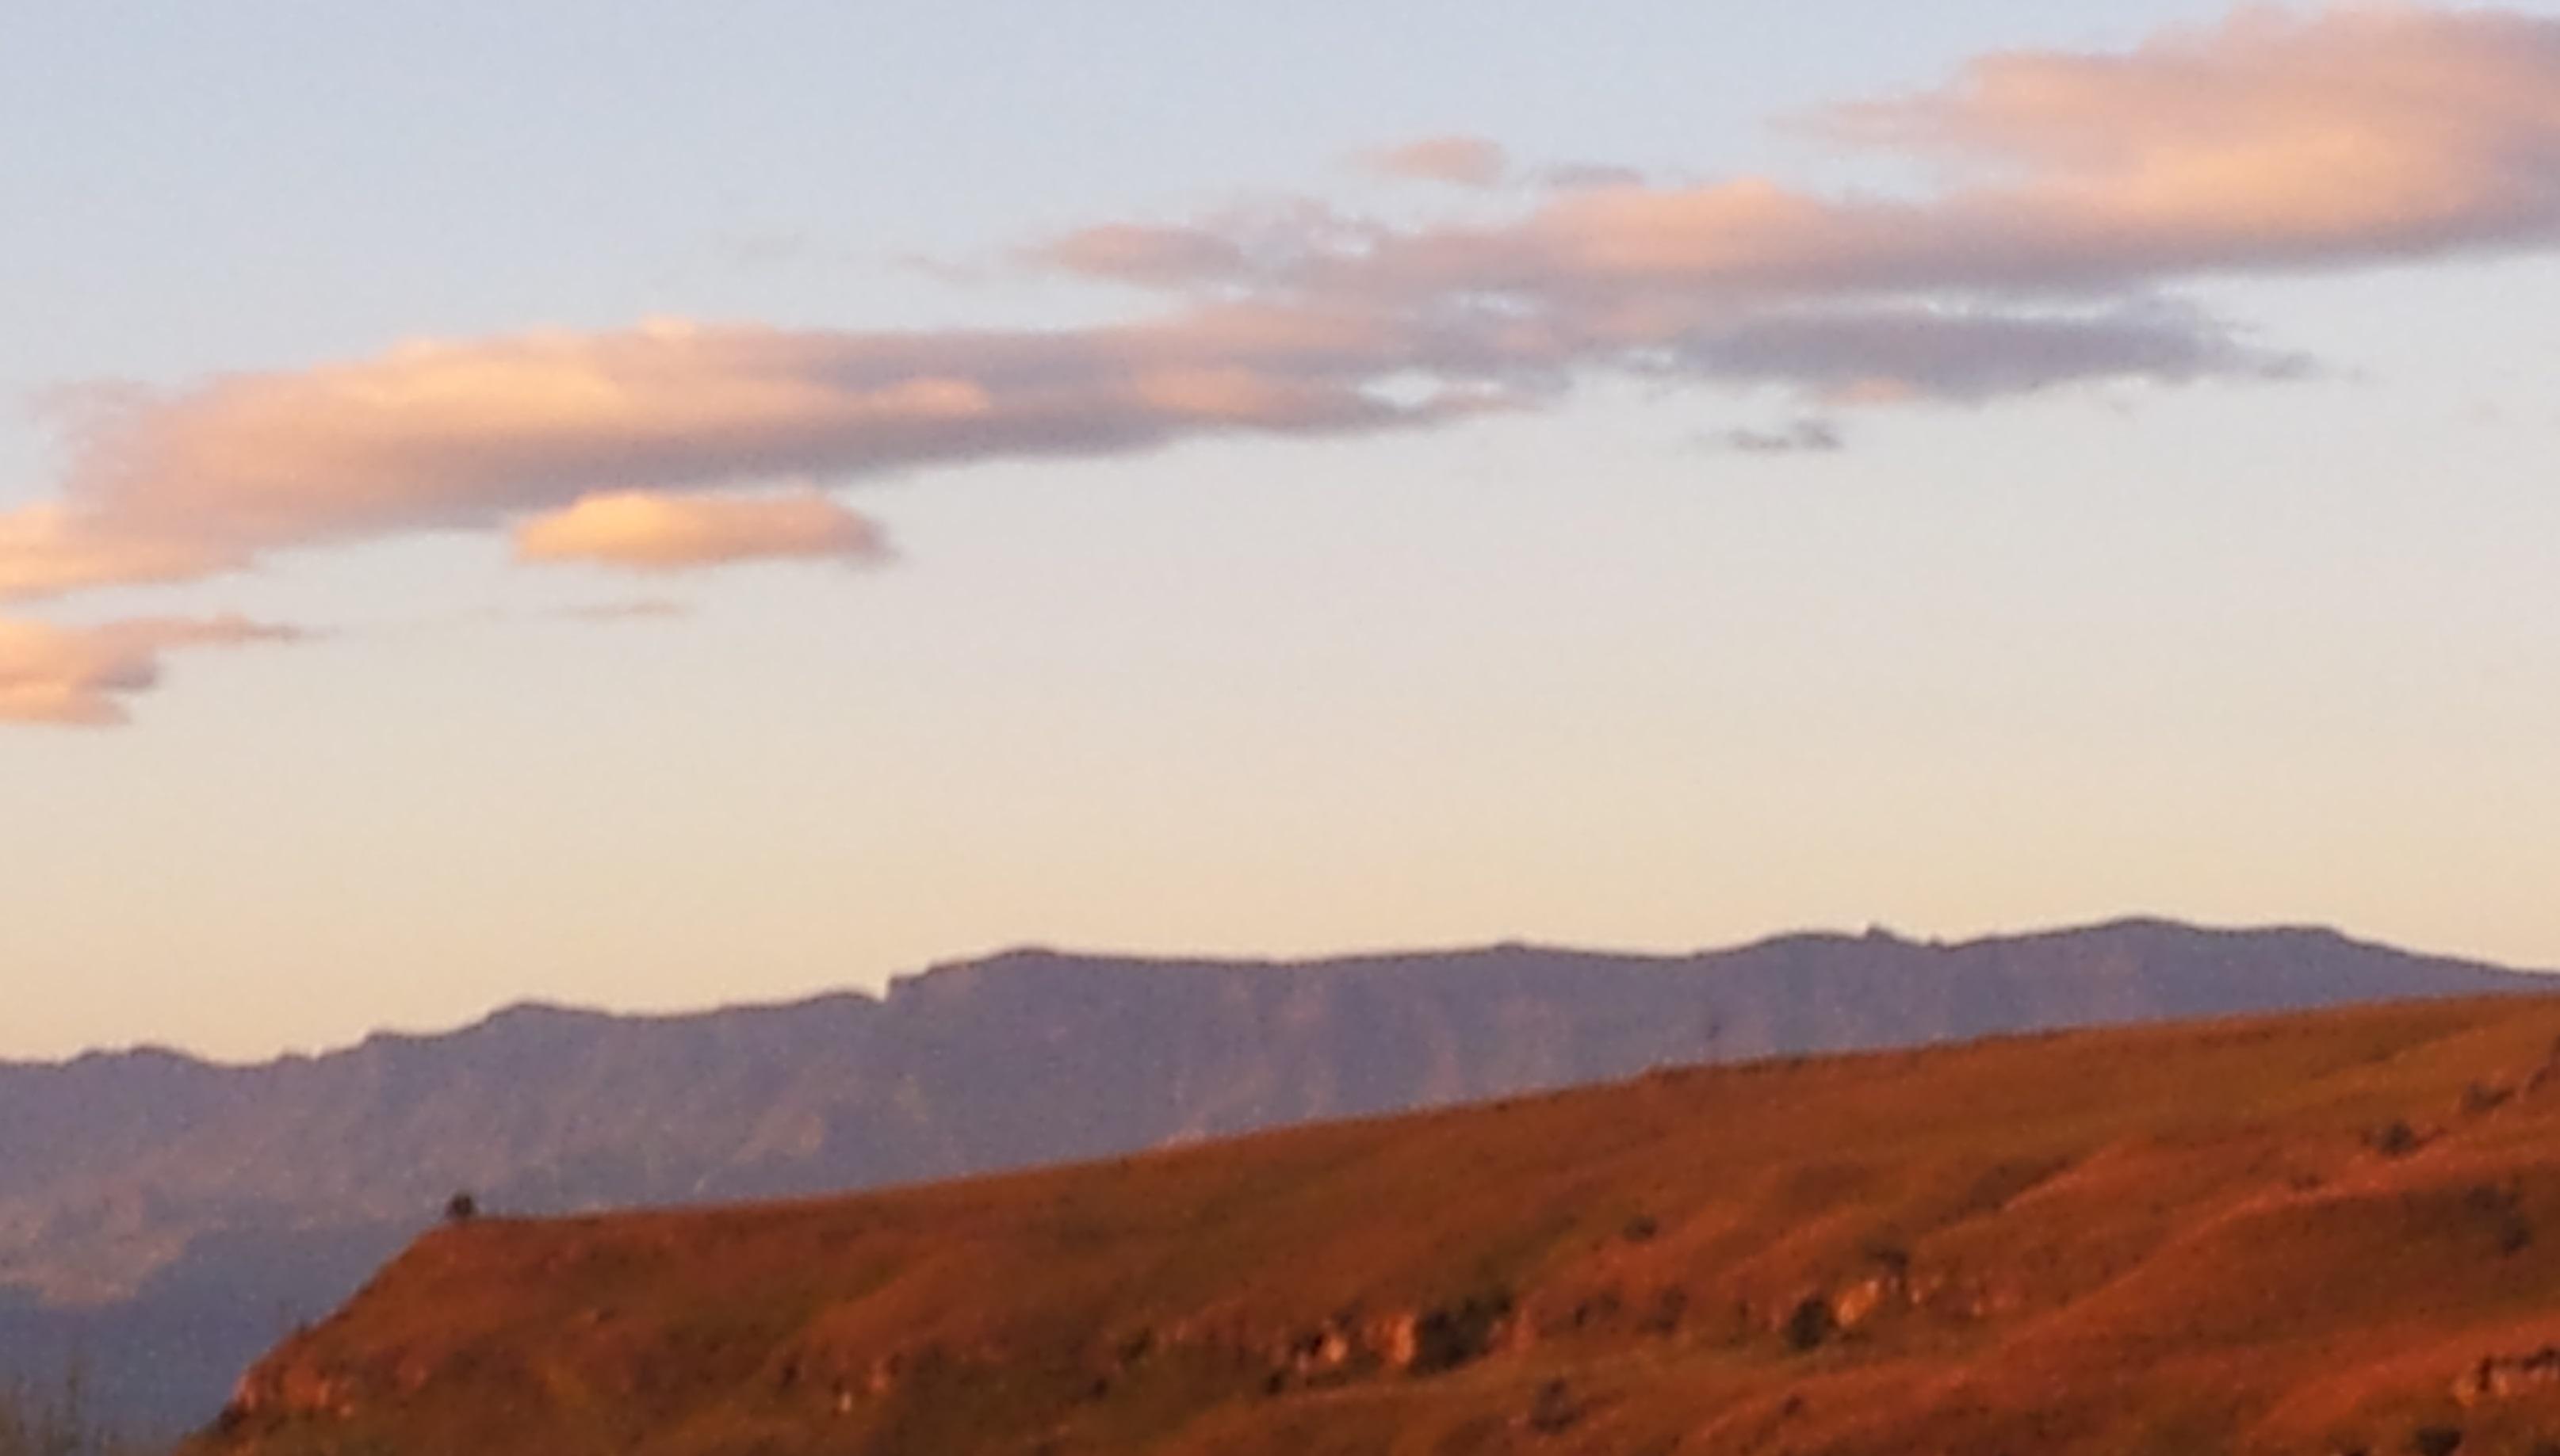 Early morning light over the Berg